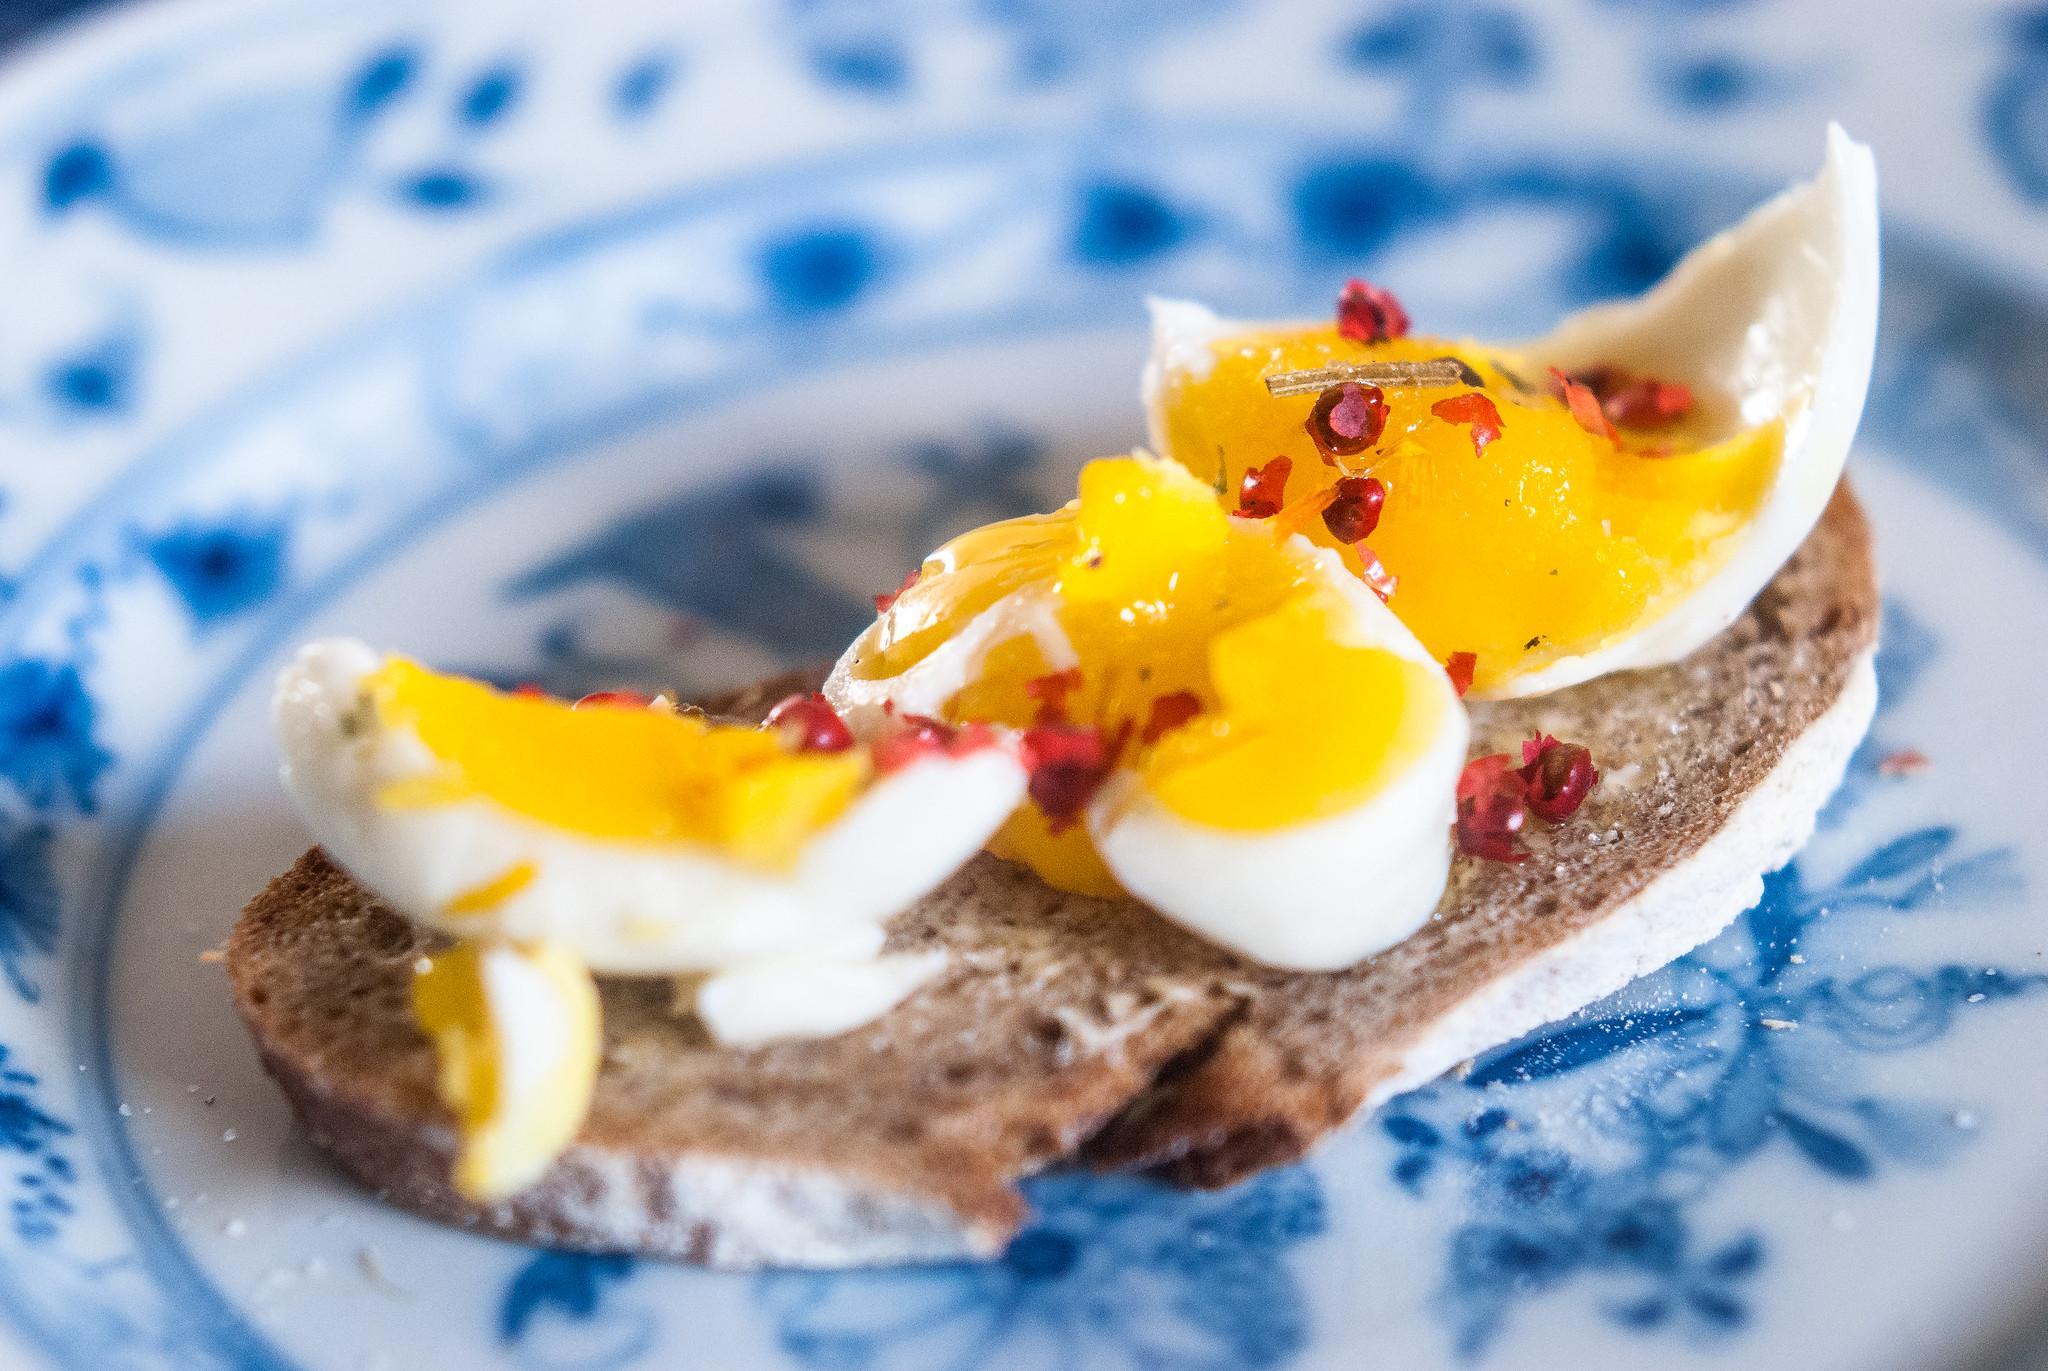 Brood met ei, olijfolie en roze peper